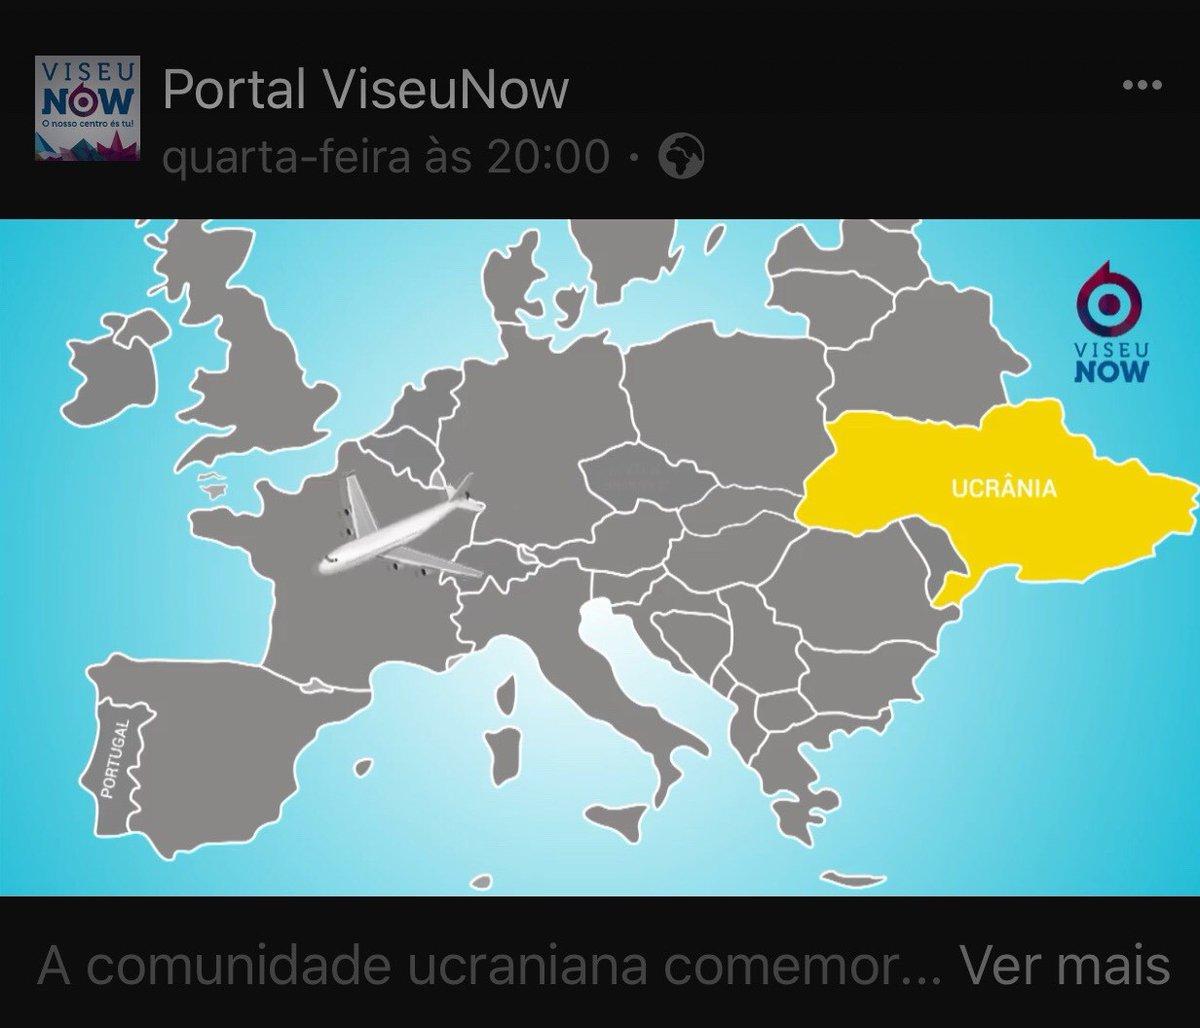 Португальский телеканал показав карту Європи зУкраїною без Криму